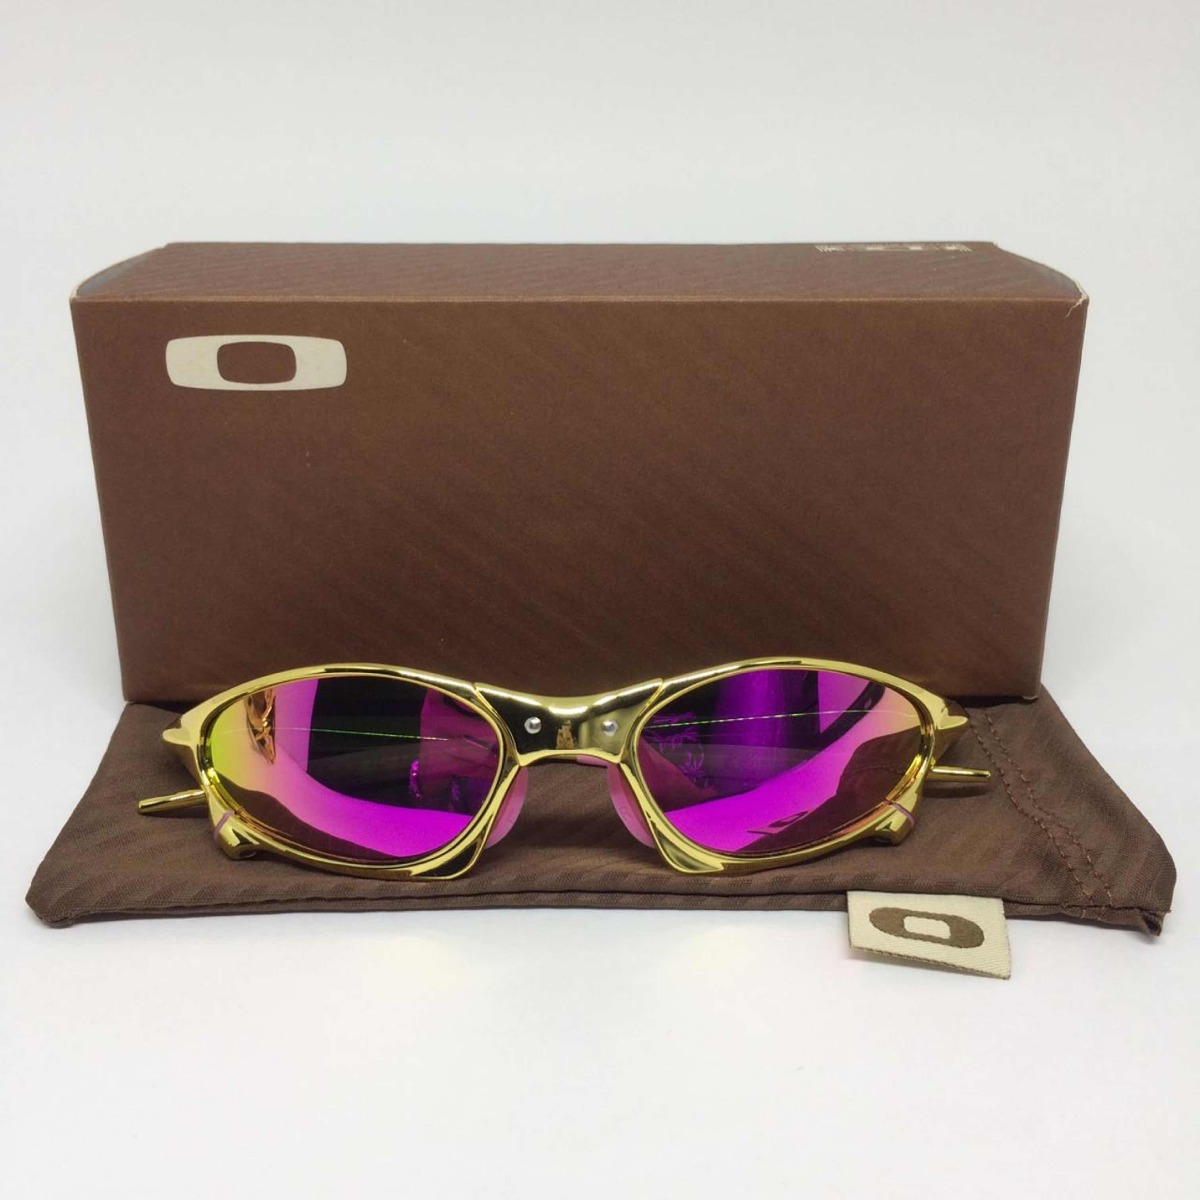 9ec1a1fbcc19e oculos oakley juliet penny gold lente rosa polarizadas. Carregando zoom.